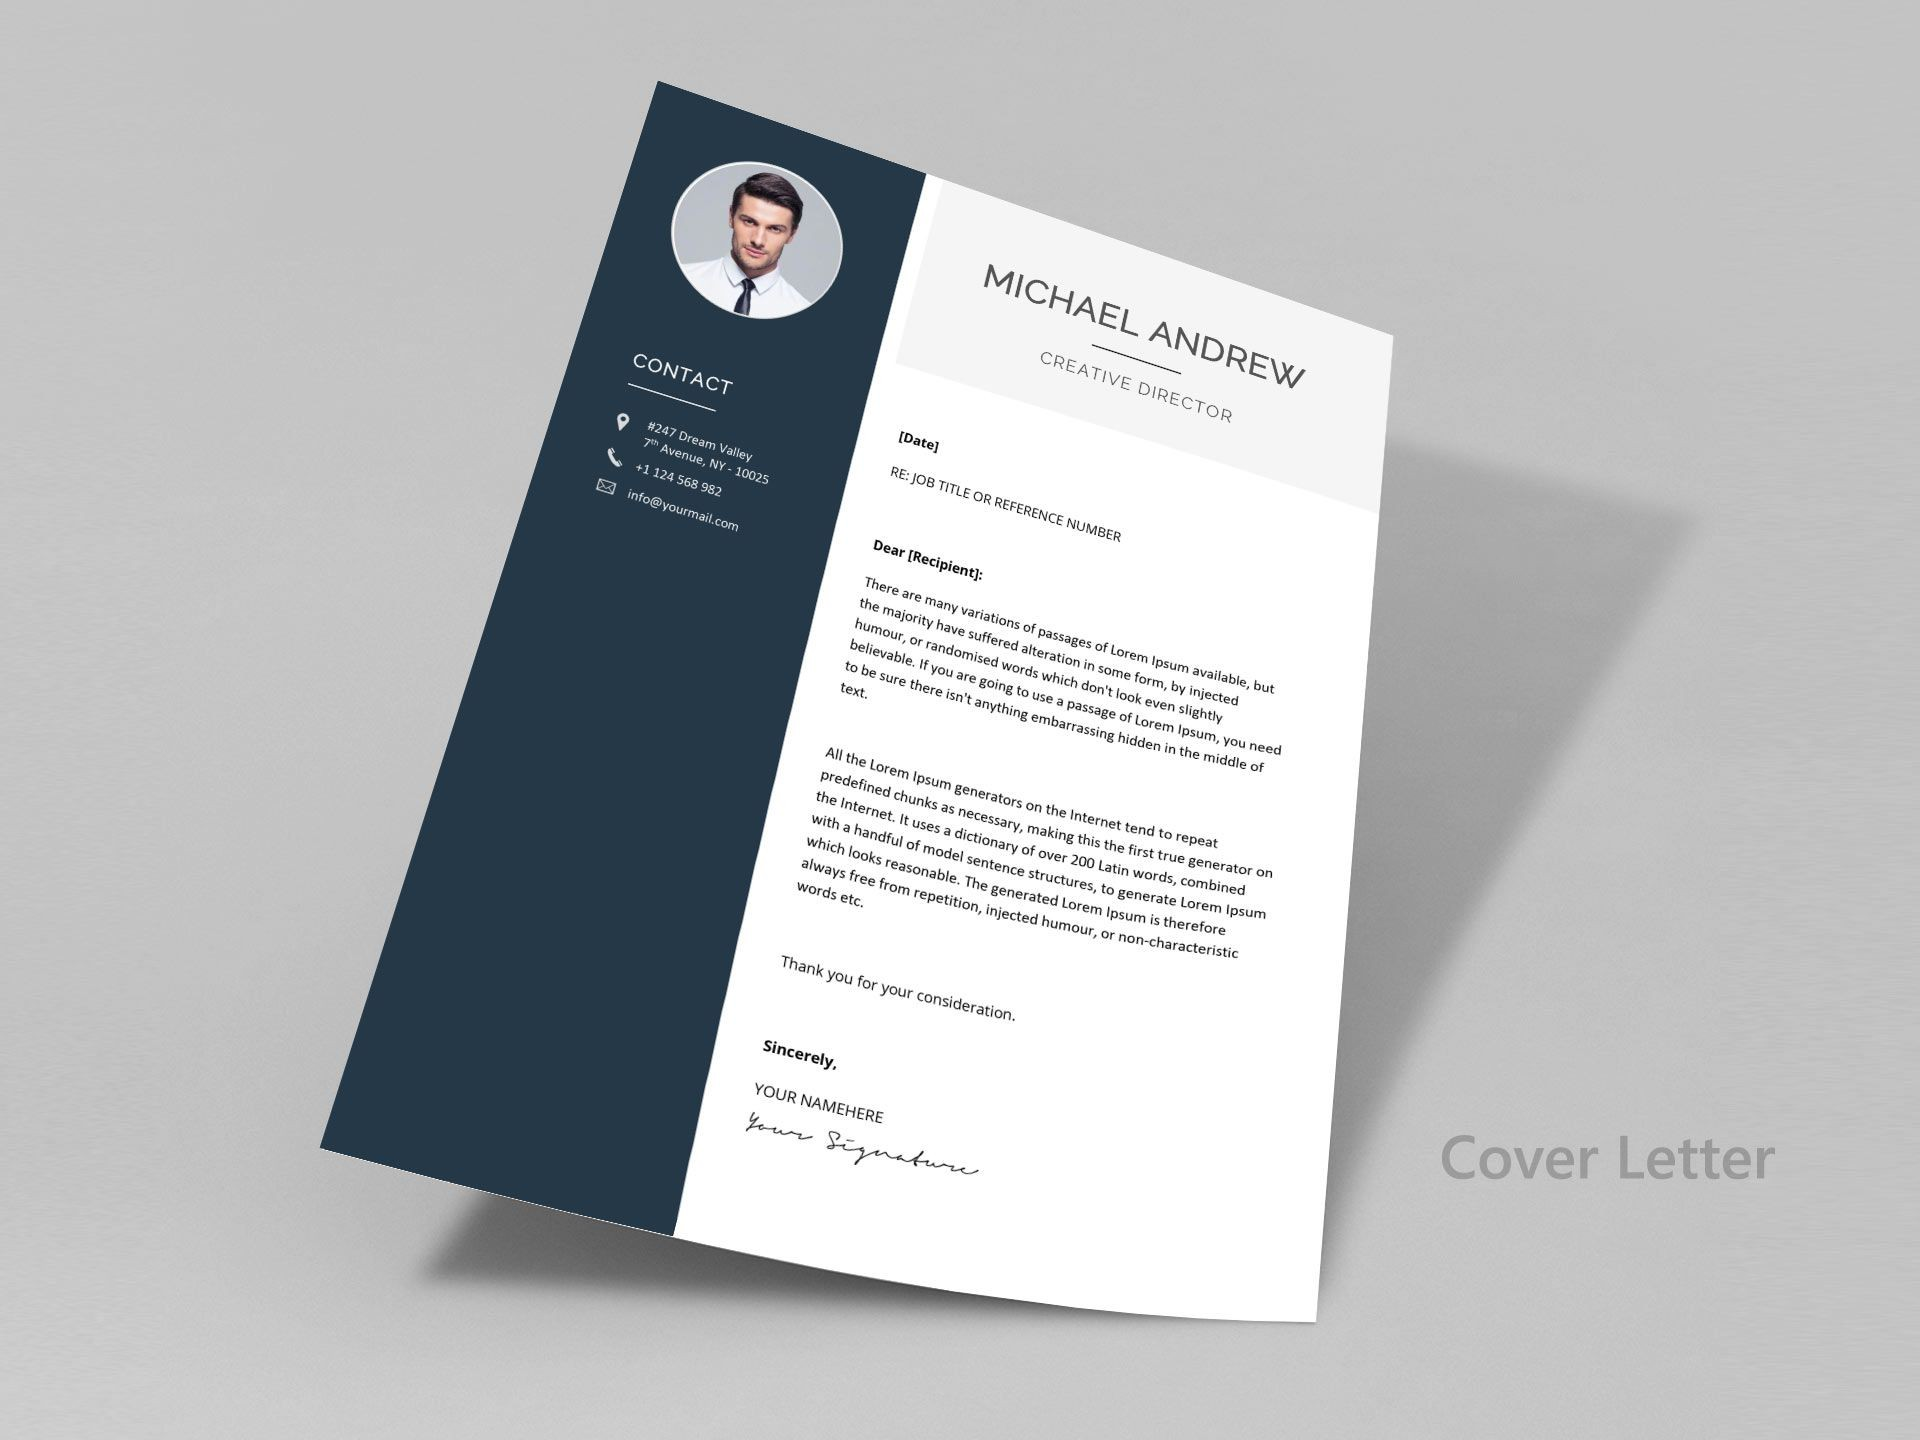 004 Wondrou Download Elegant Resume Template Microsoft Word Highest Clarity 1920